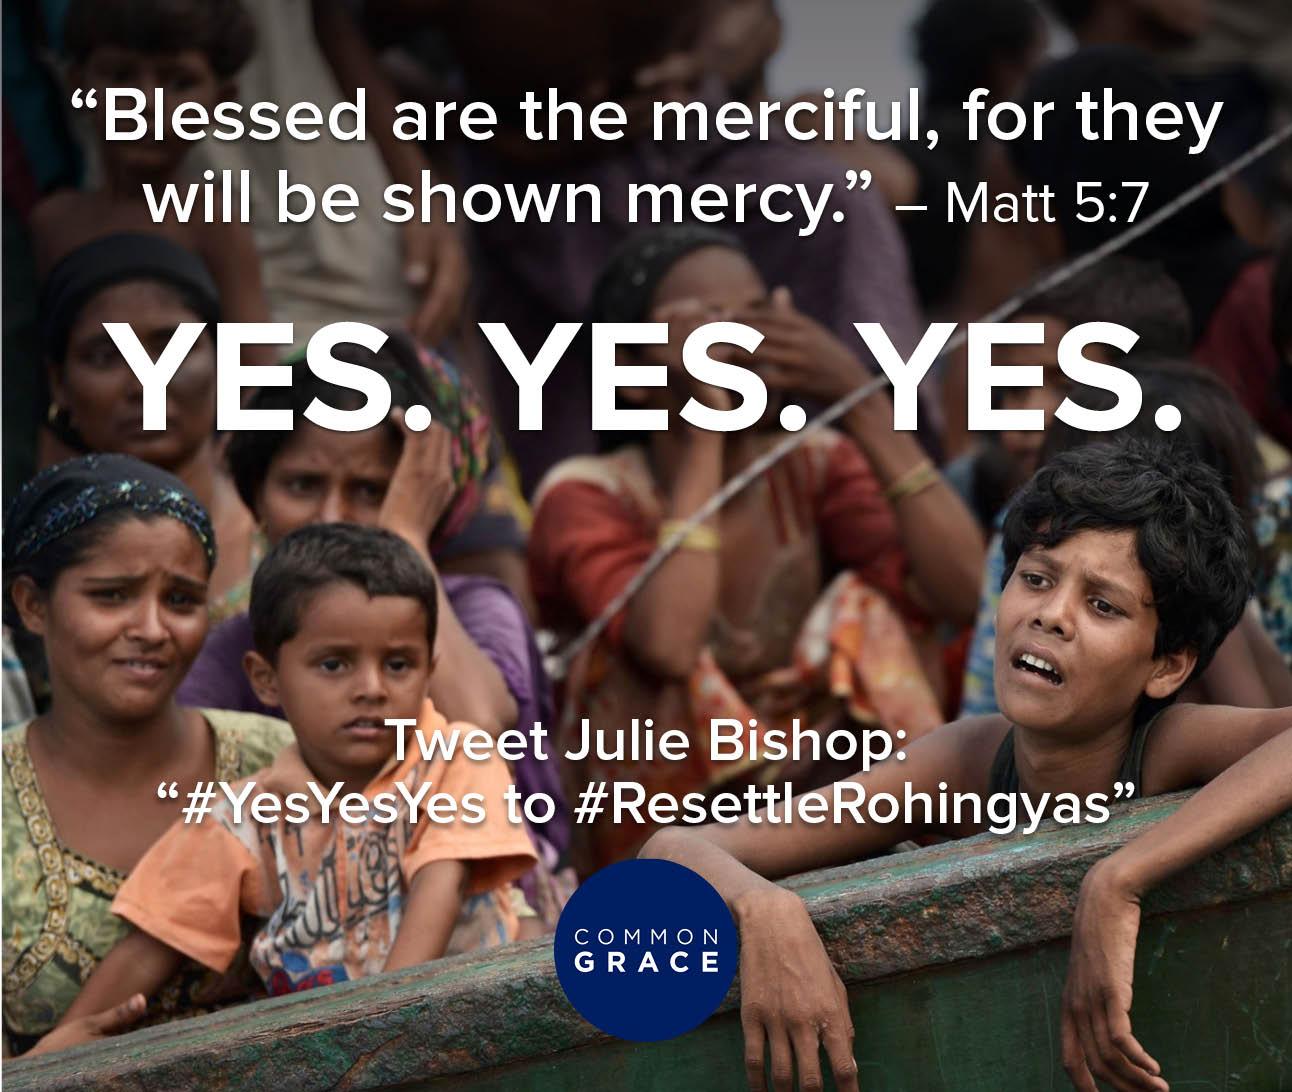 Yes. Rohingyans Still at Sea